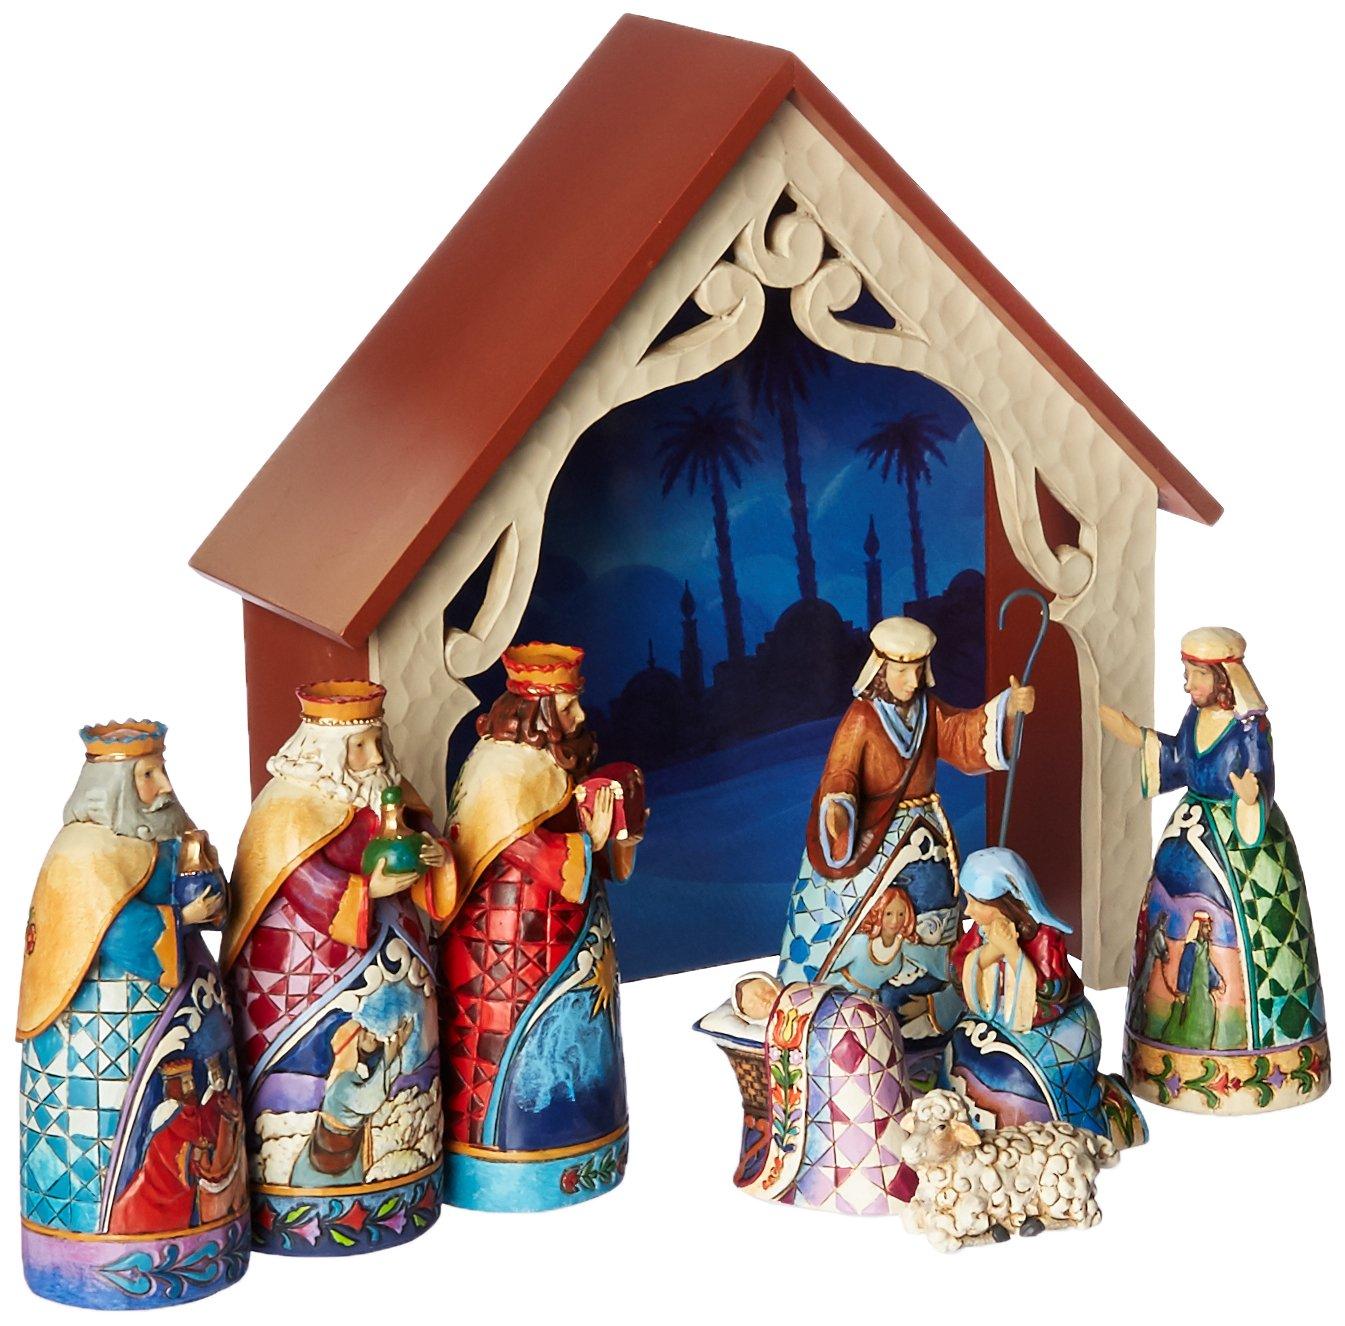 "Jim Shore Heartwood Creek 9-Piece Mini Nativity Set Stone Resin Figurine, 9.75"" by Jim Shore for Enesco (Image #1)"